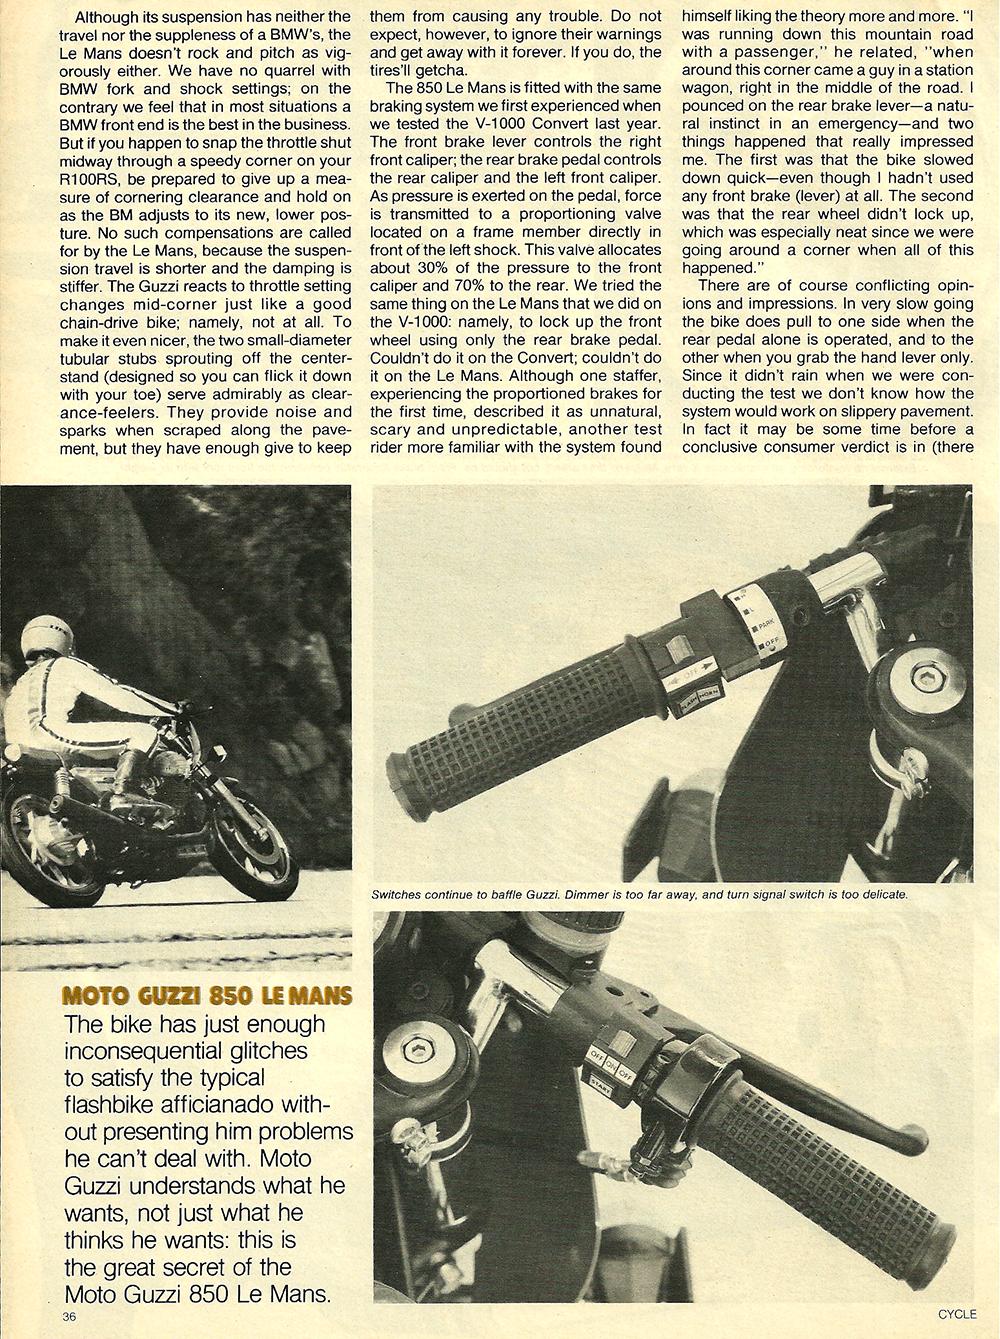 1977 Moto Guzzi 850 LeMans road test 05.jpg